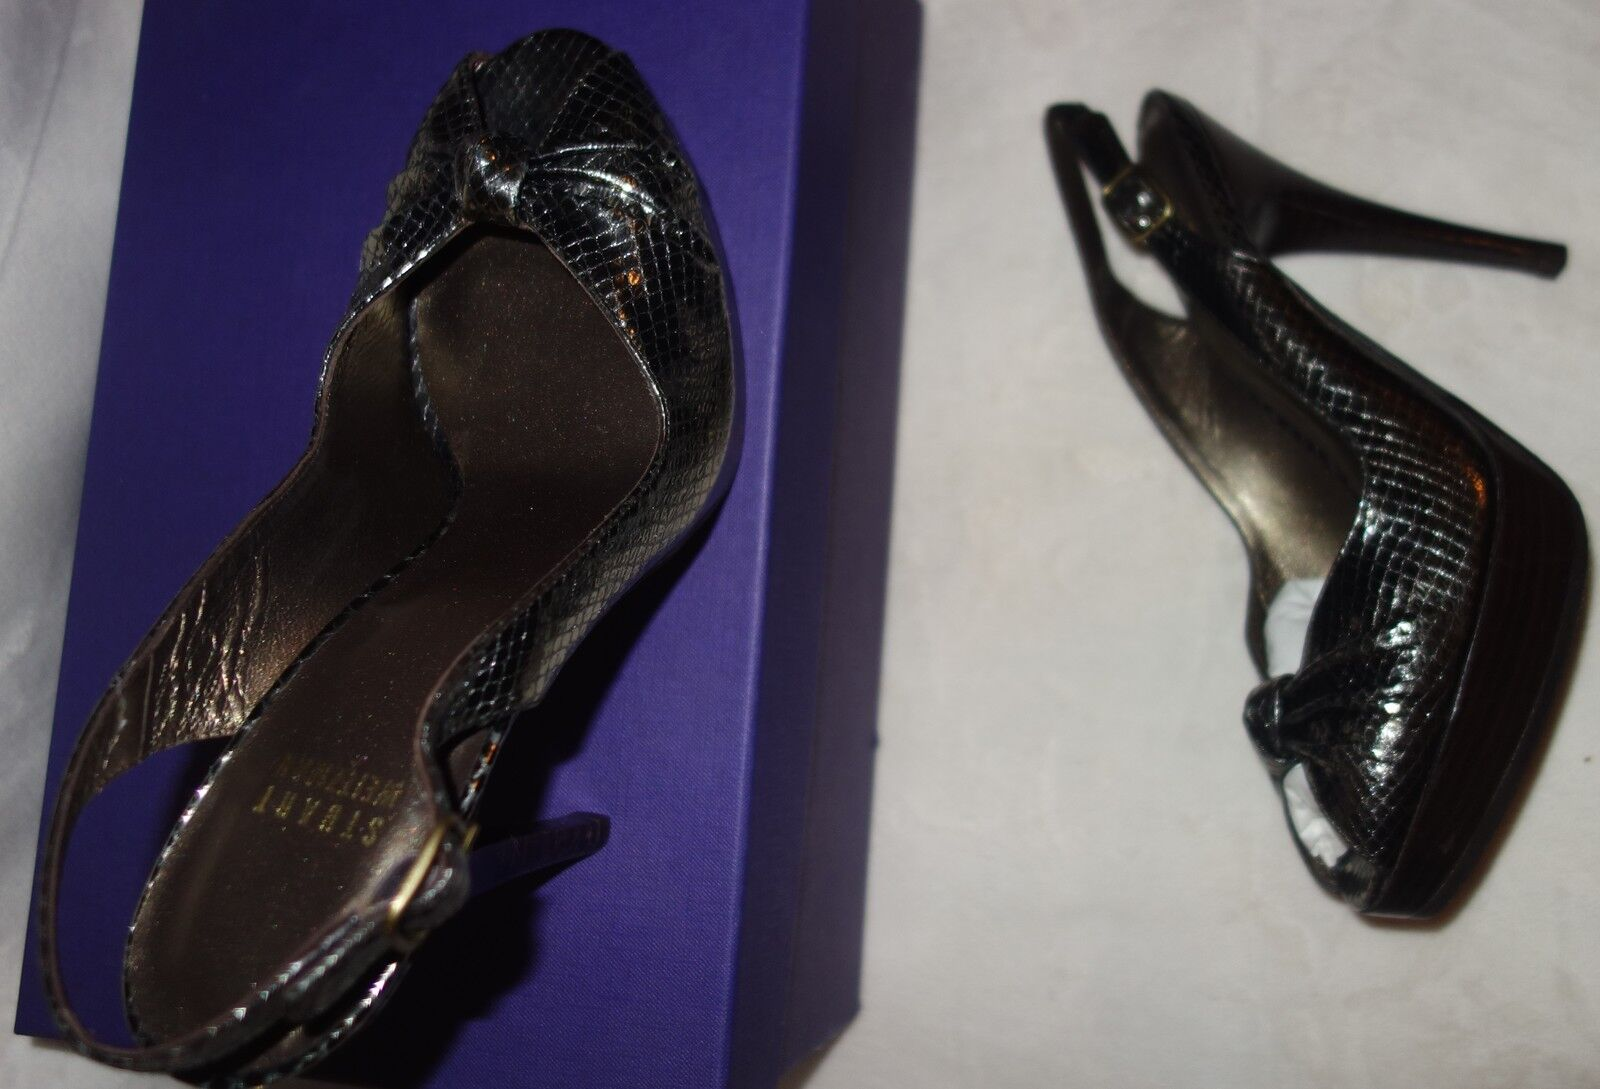 Stuart Weitzman 'Karnival' SZ Genuine Leder Heels sz 38.5 US SZ 'Karnival' 8 new 941657